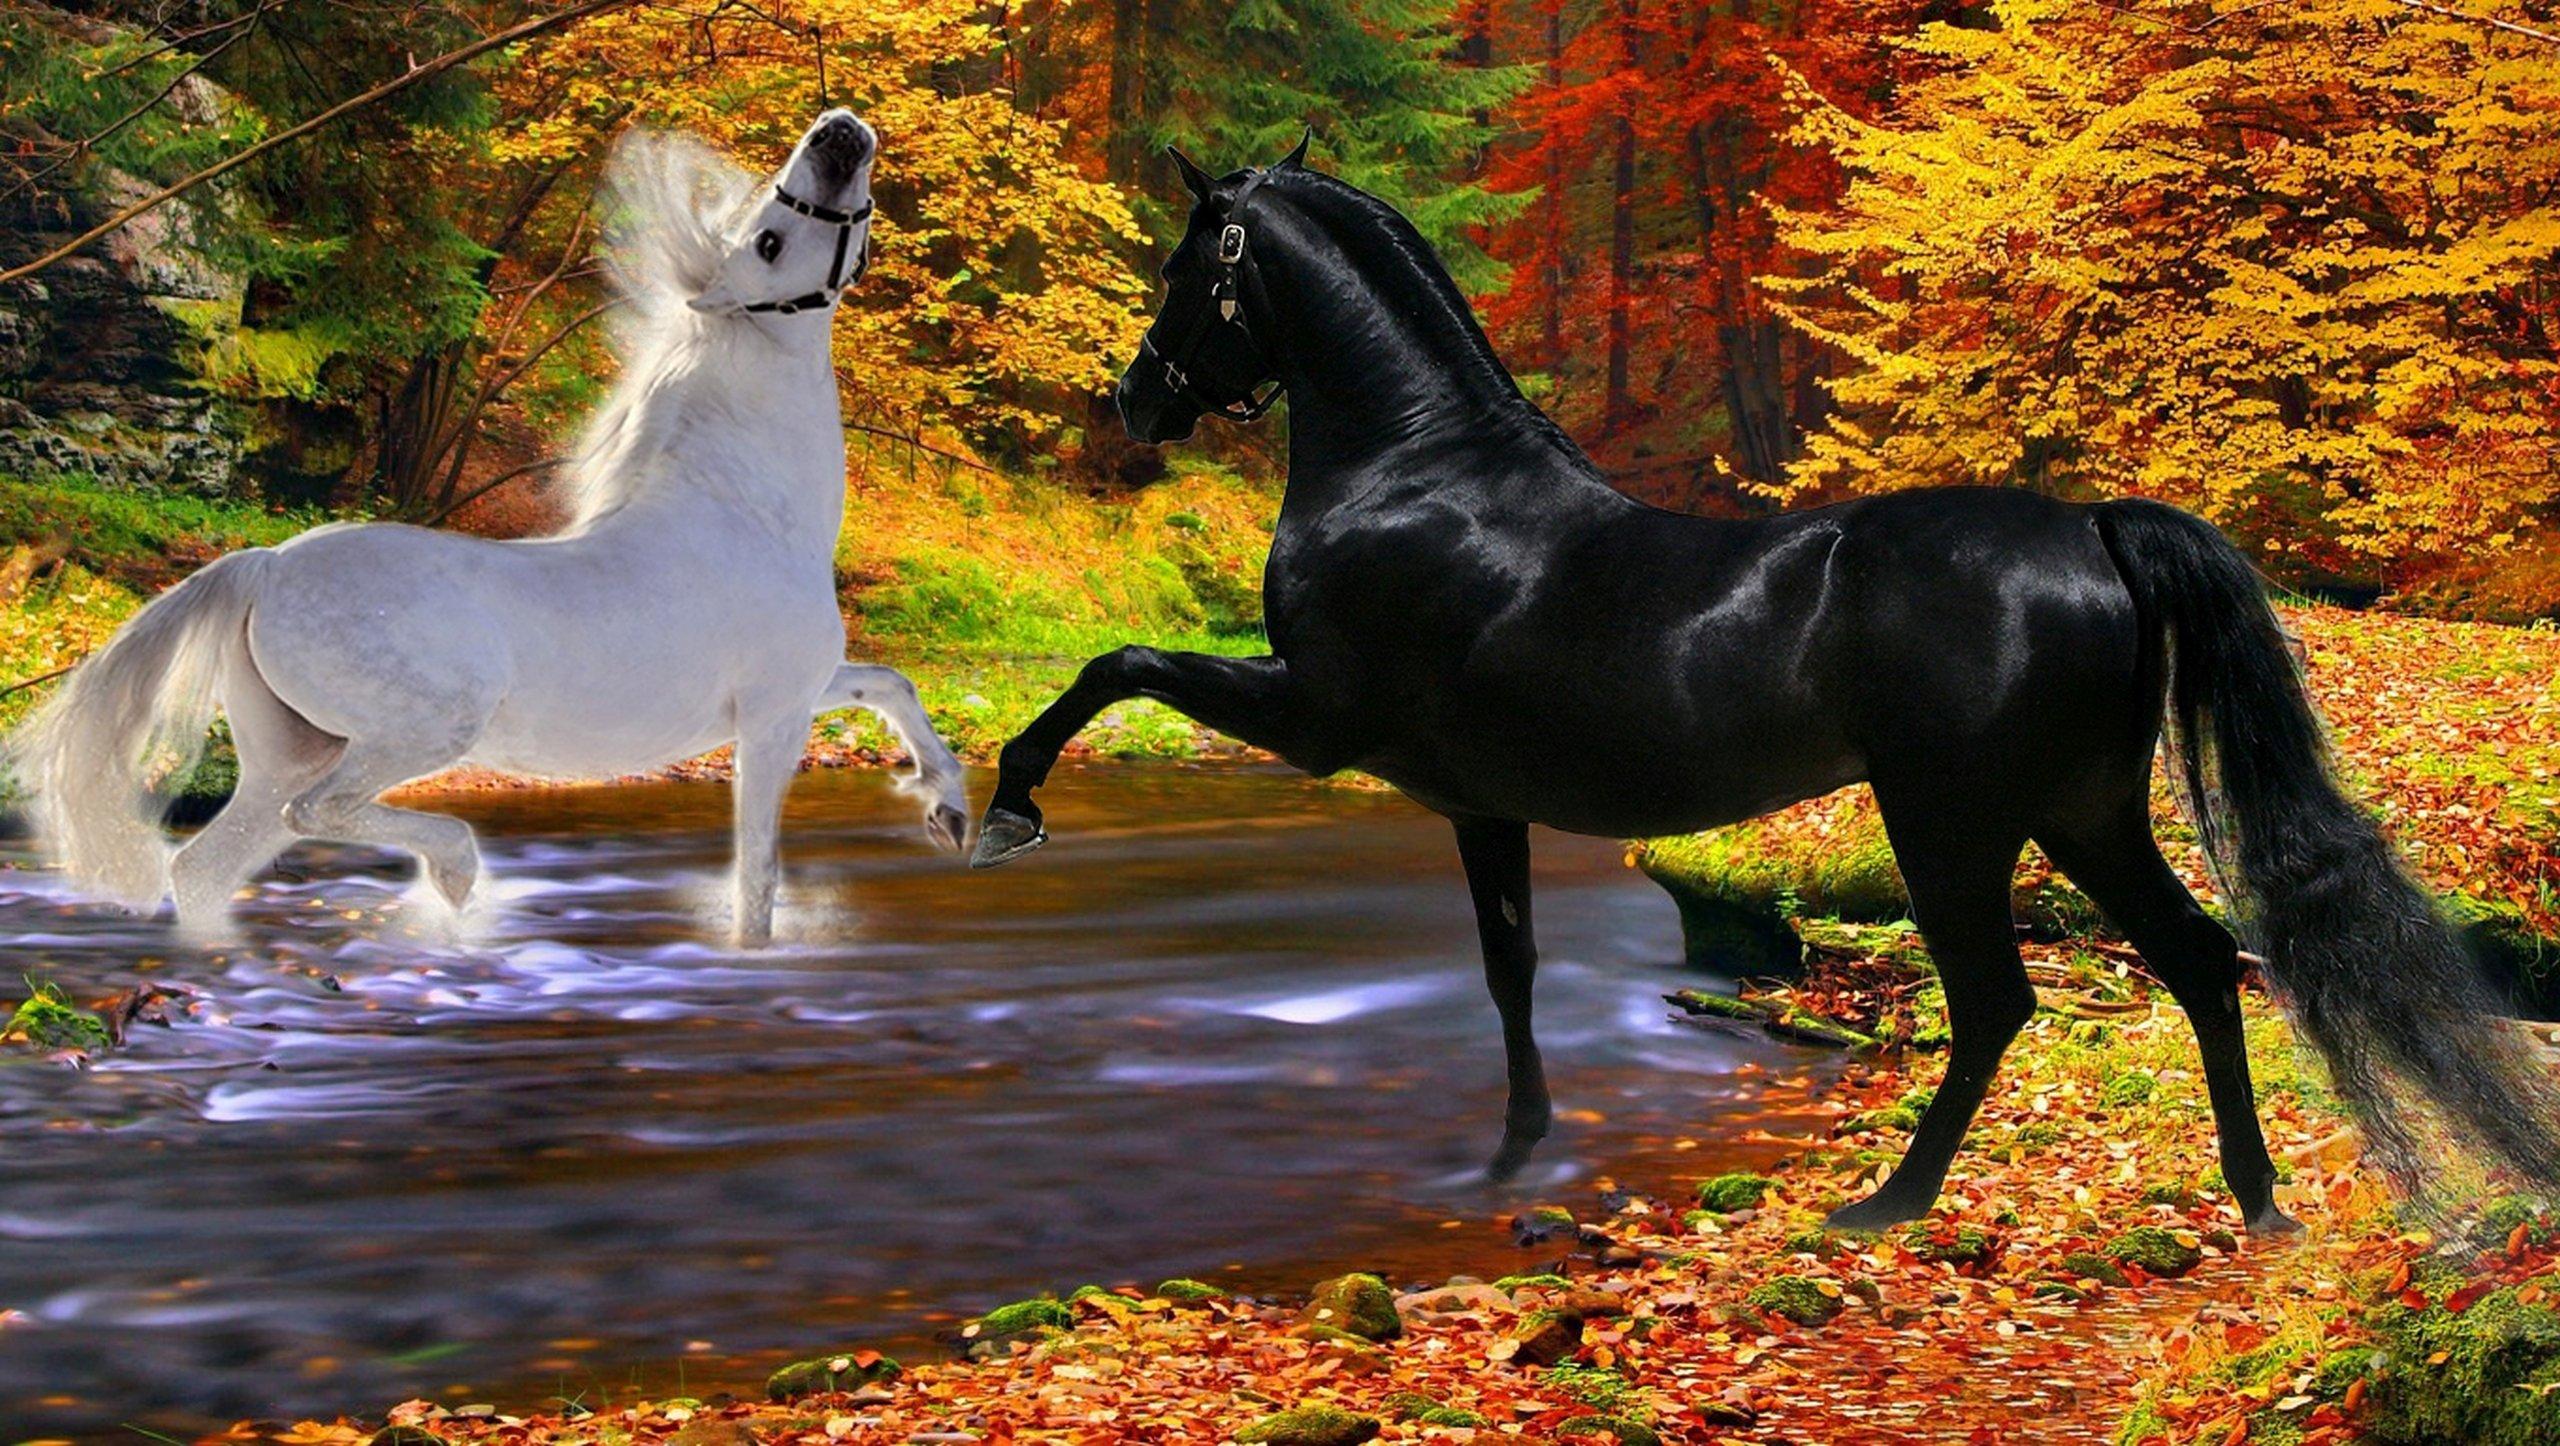 Horses Black Playfulness Couple River White Two Autumn Stallion Wallpaper 2560x1446 475034 Wallpaperup